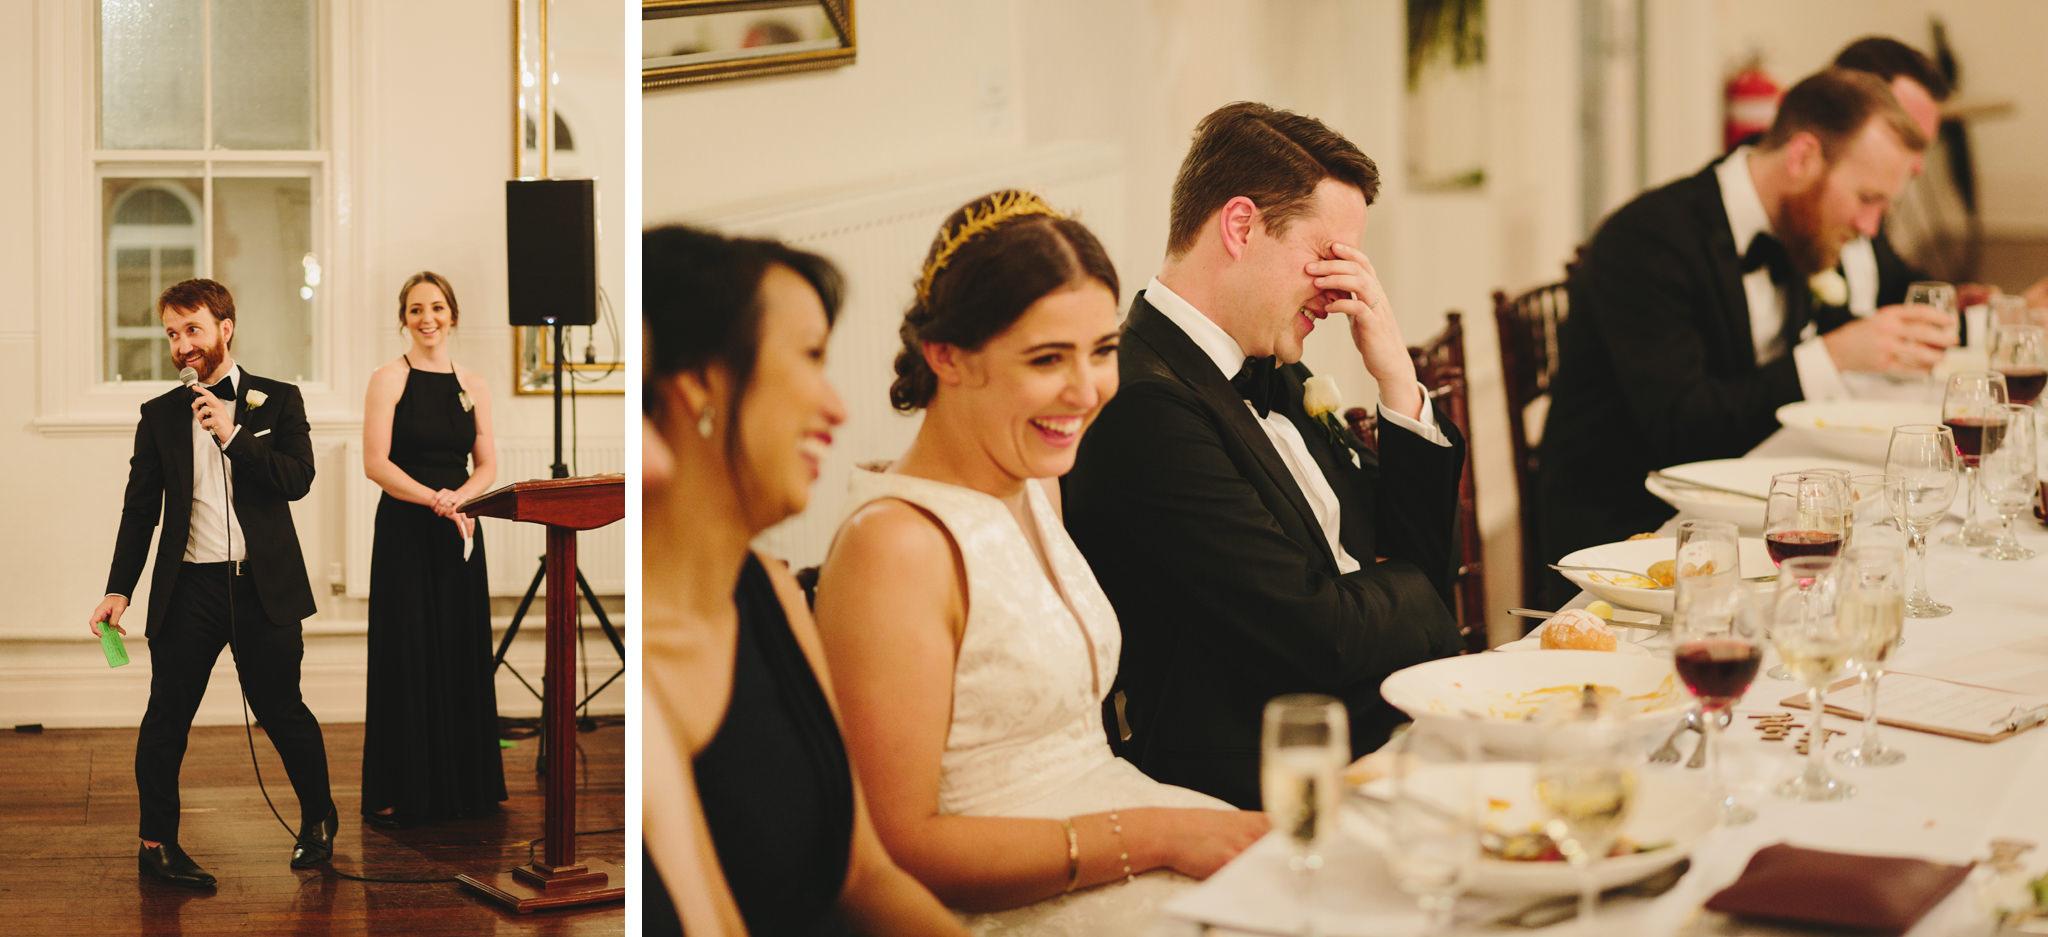 Abbotsford_Convent_Wedding_Peter_Anna121.JPG